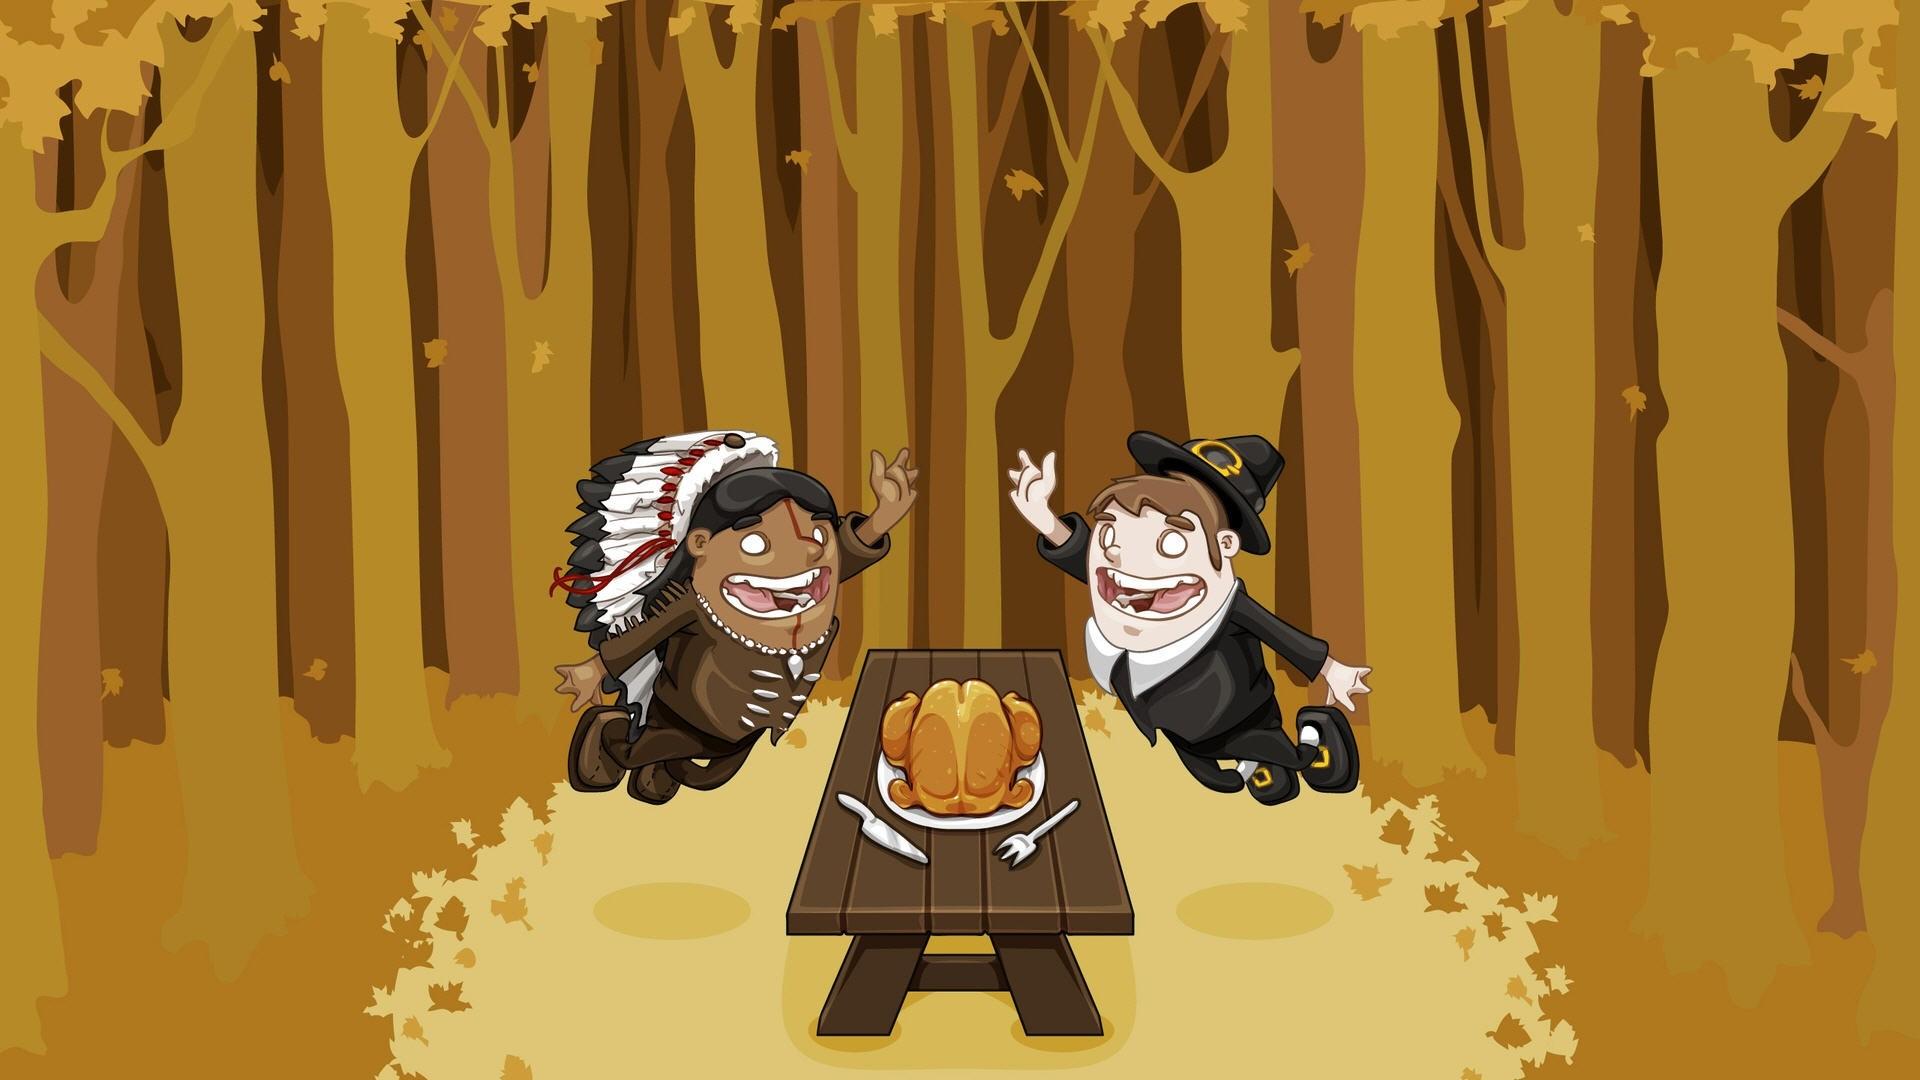 Cute Thanksgiving Desktop Background Wallpapers